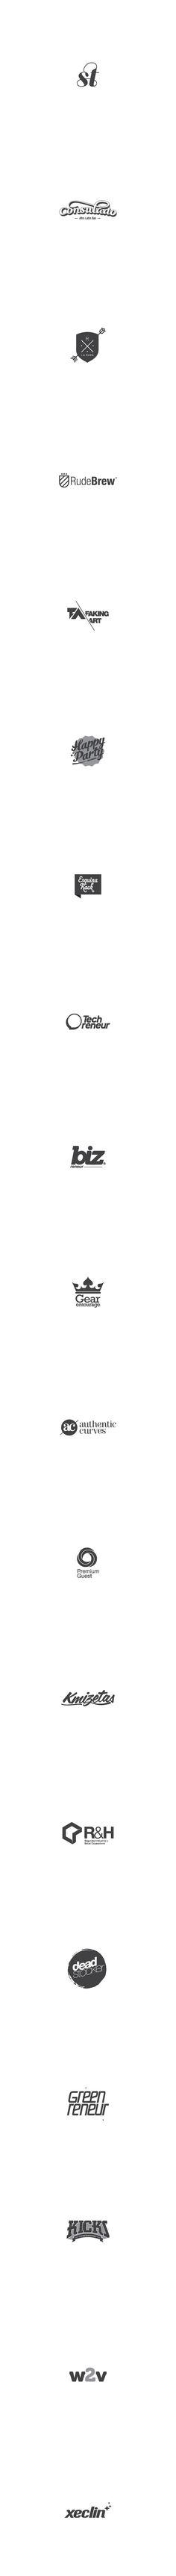 Logos / 2012 on Behance